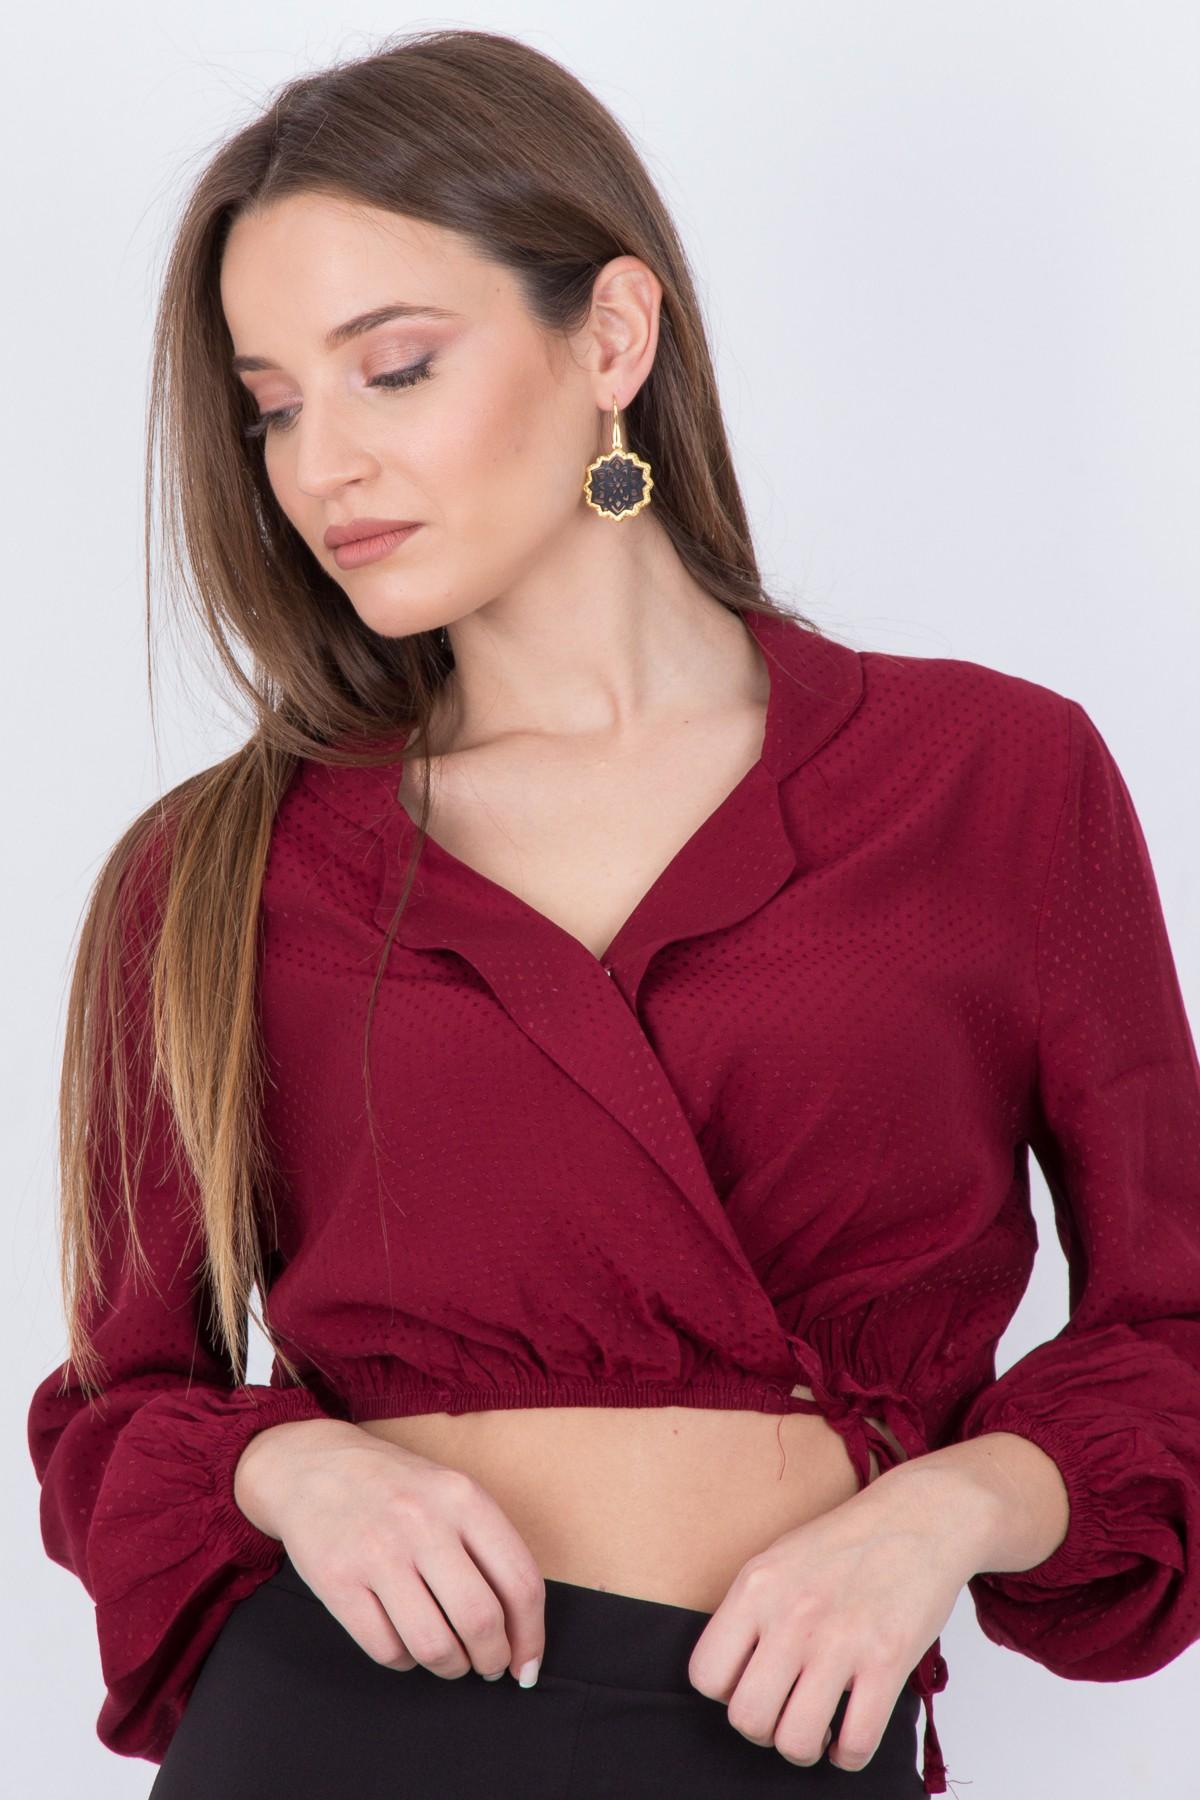 cc6aade384c7 ONAGE Γυναικεία μπλούζα κρουαζέ με σούρες ΜΠΟΡΝΤΩ - Glami.gr